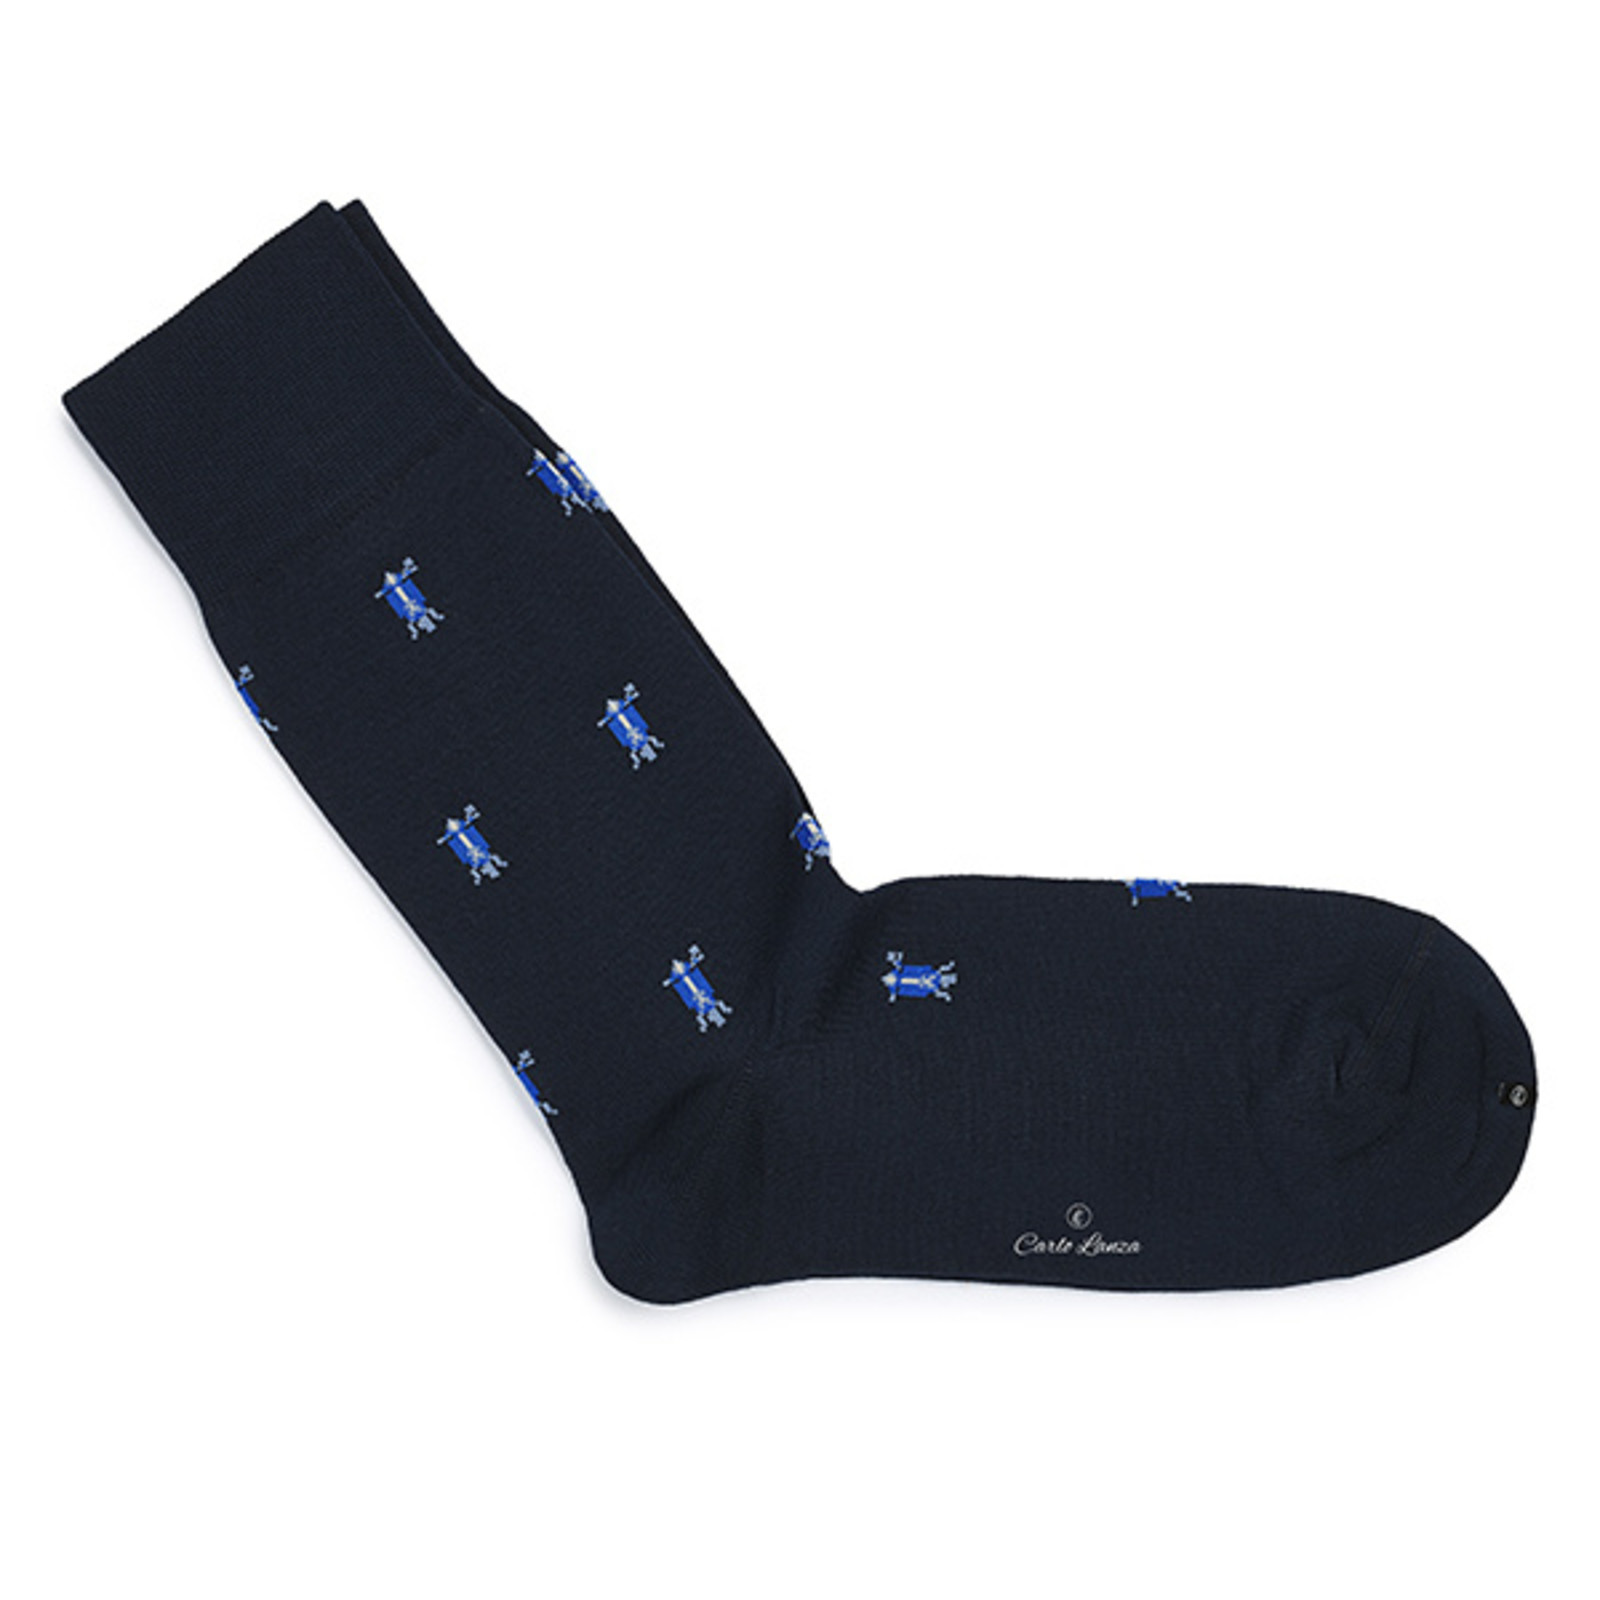 Carlo Lanza Blue Italian scooter socks